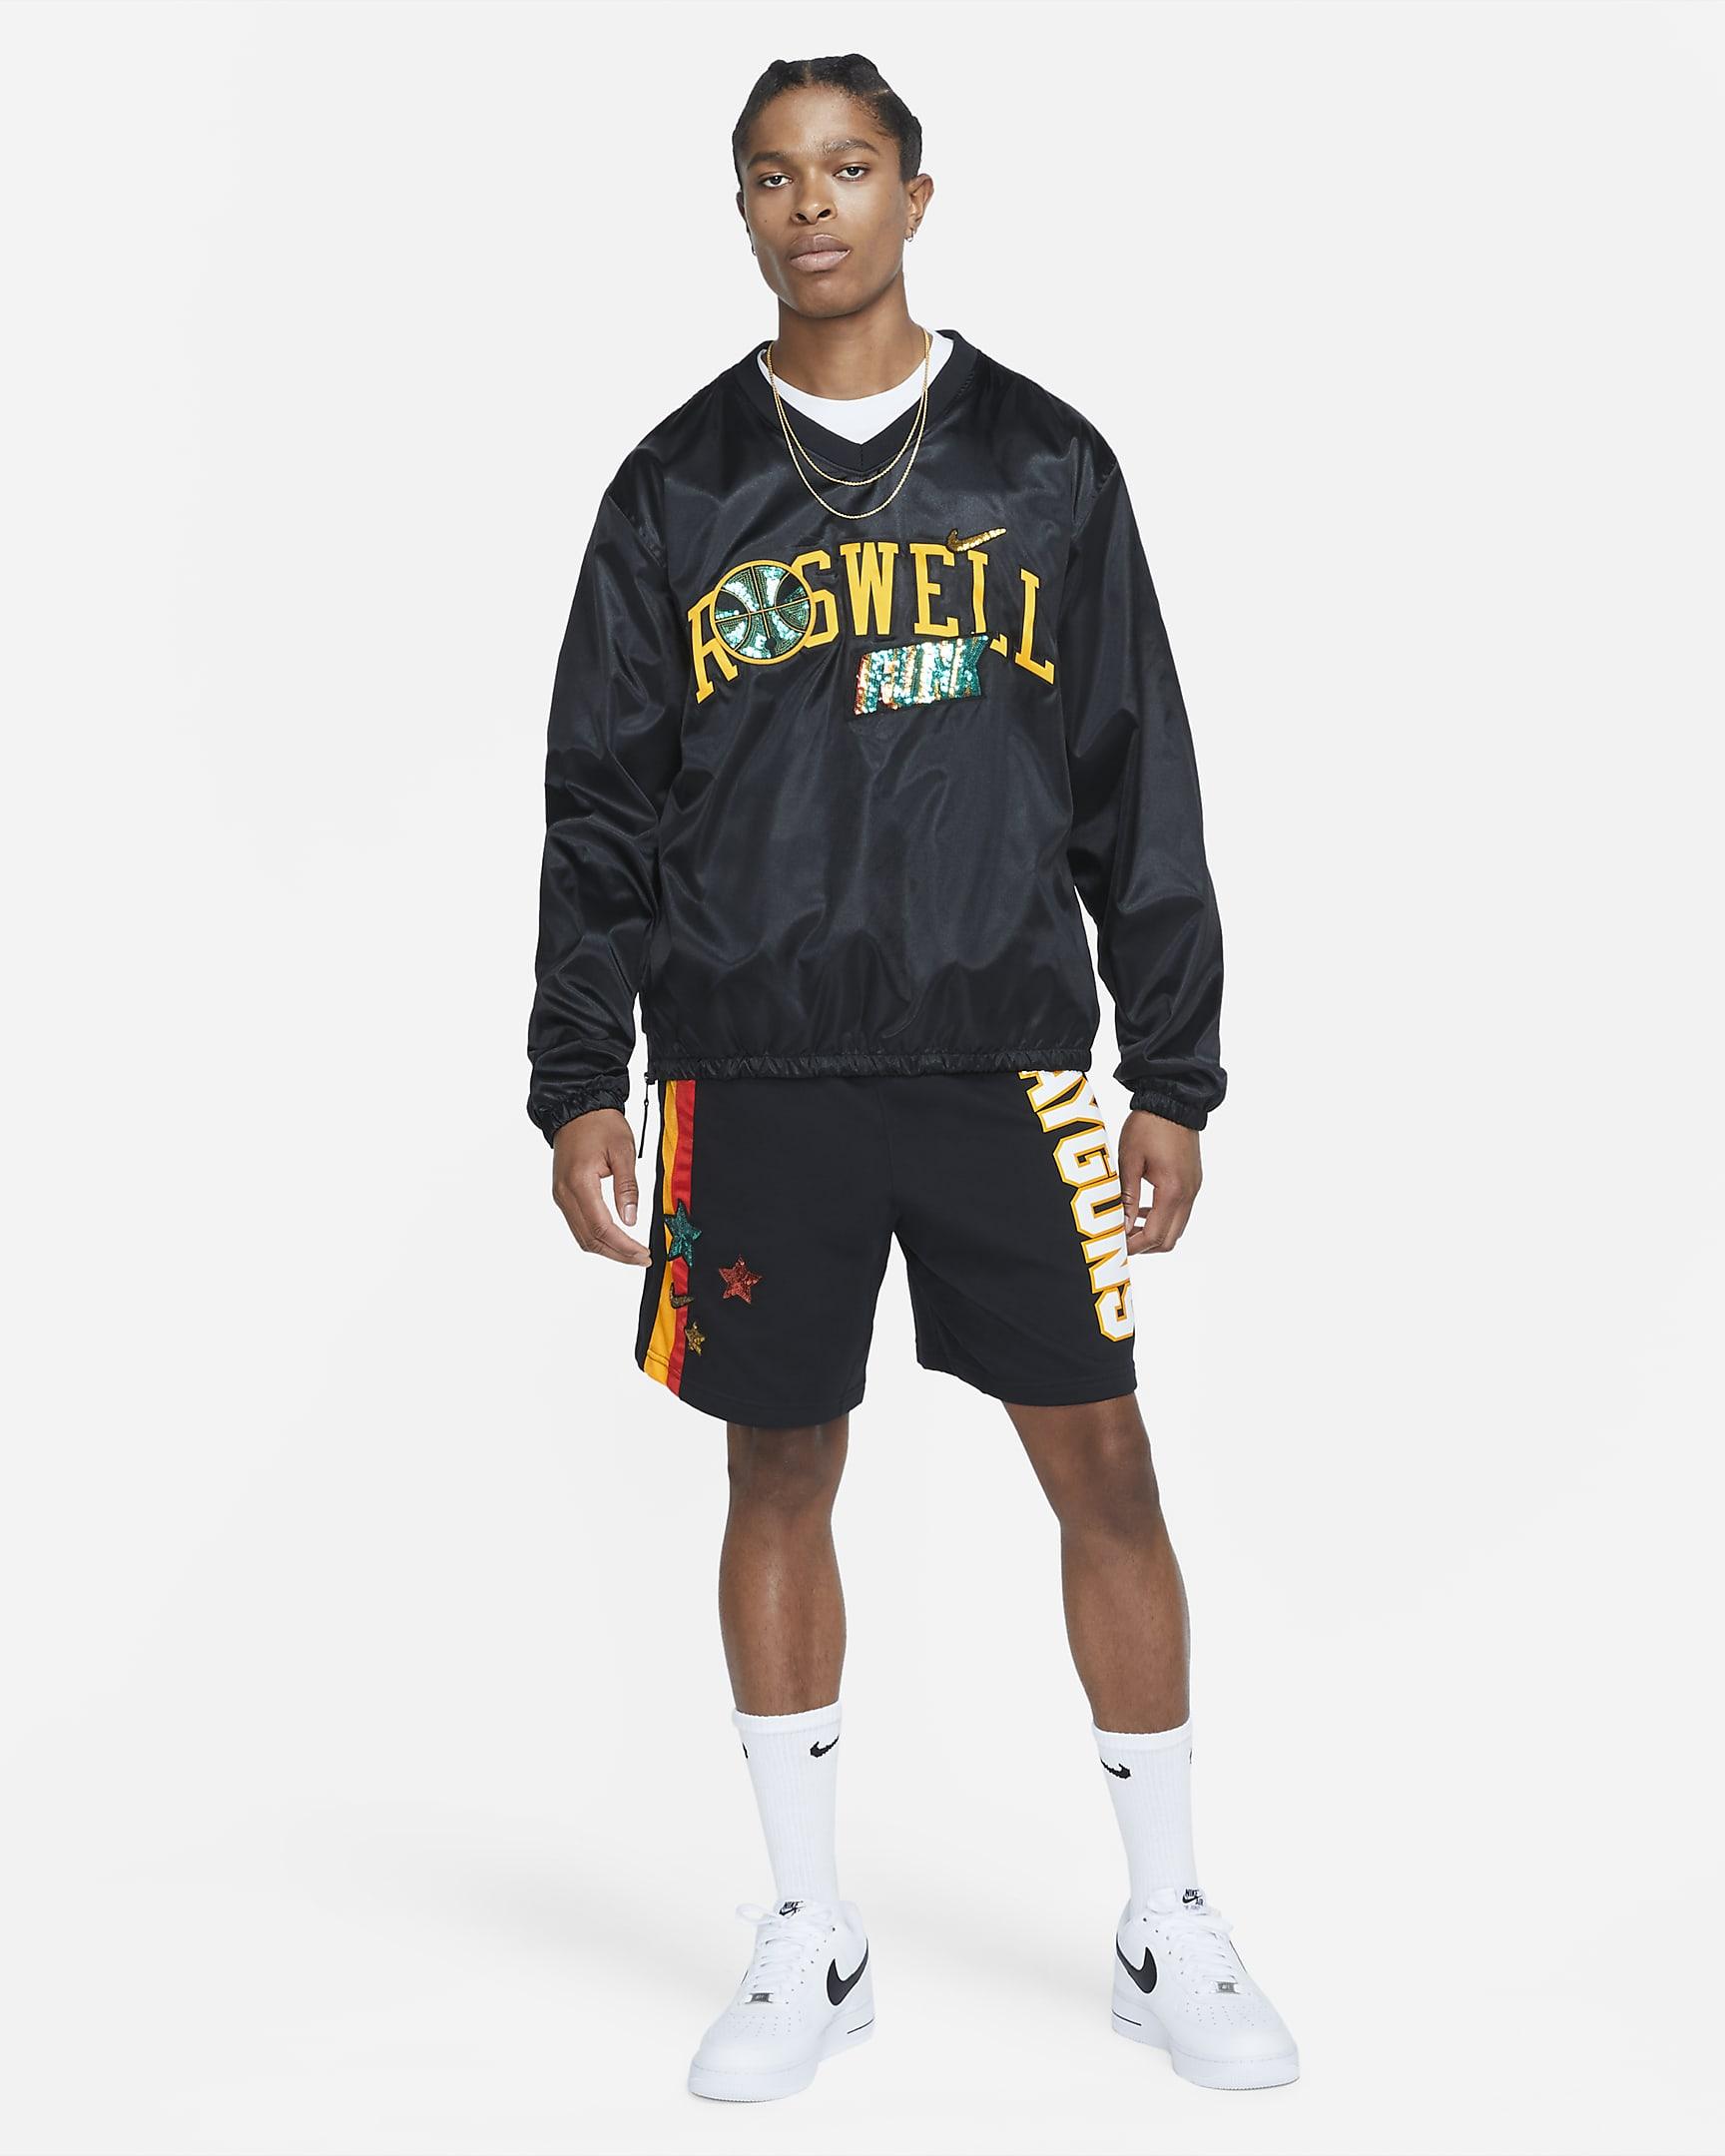 dri-fit-rayguns-mens-premium-basketball-shorts-V329rk